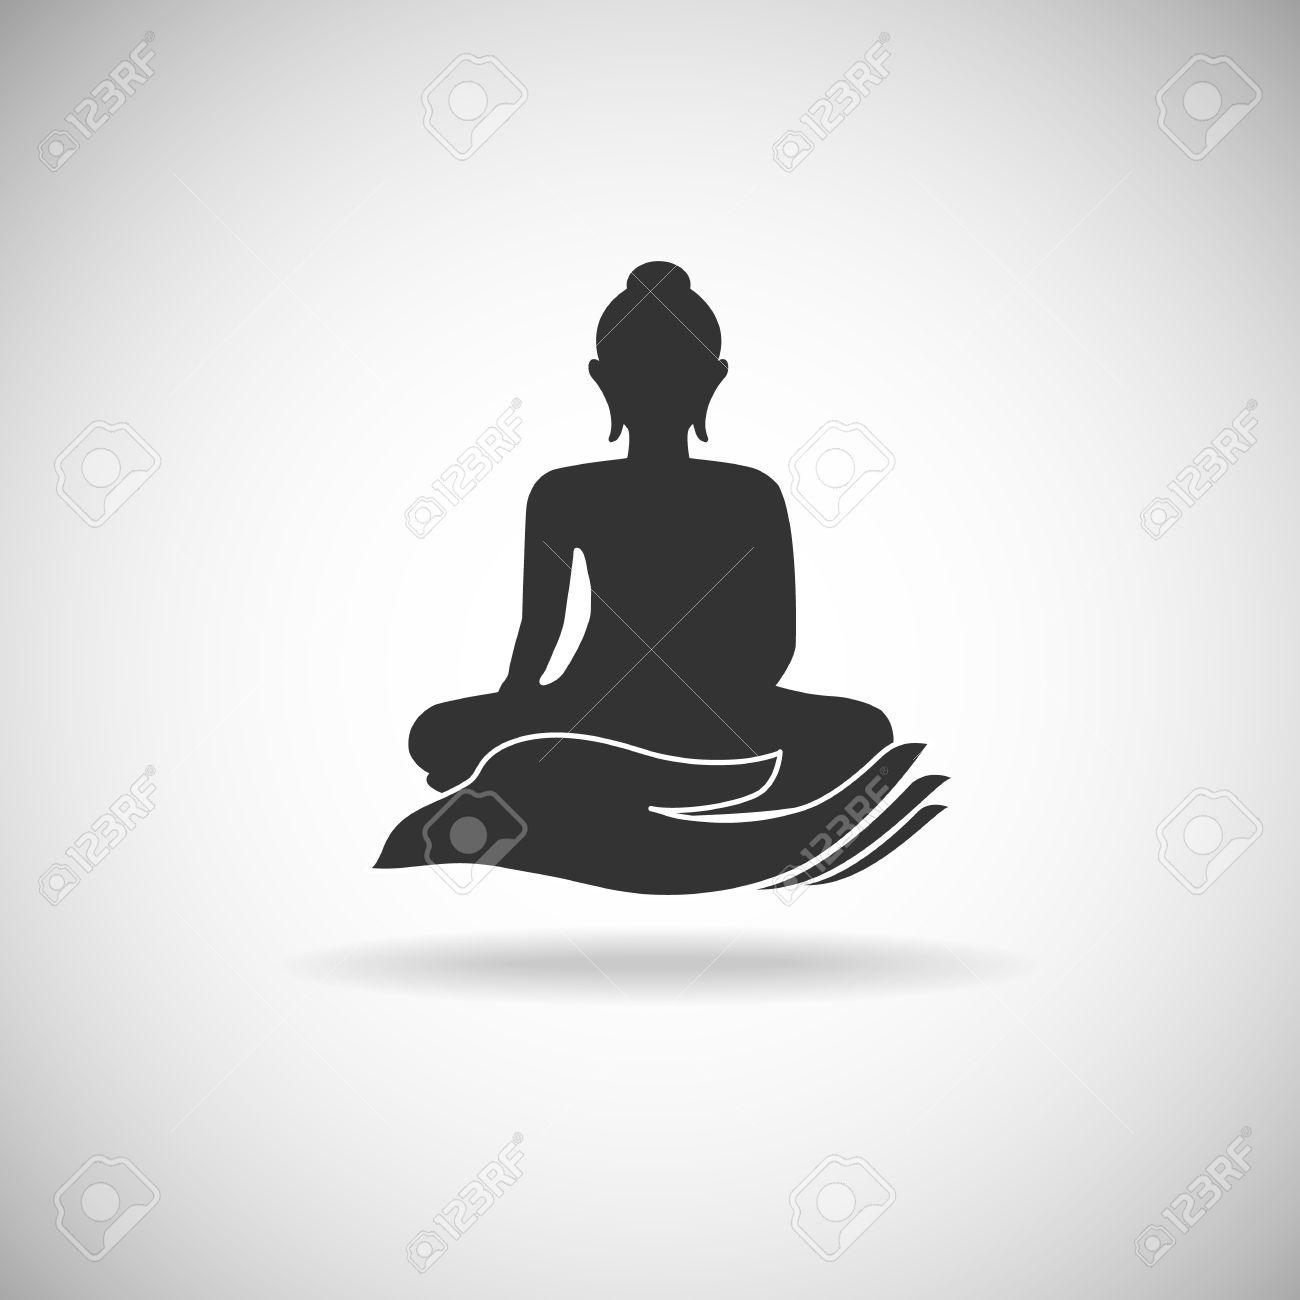 bouddha dessin bouddha sur la silhouette de la main illustration